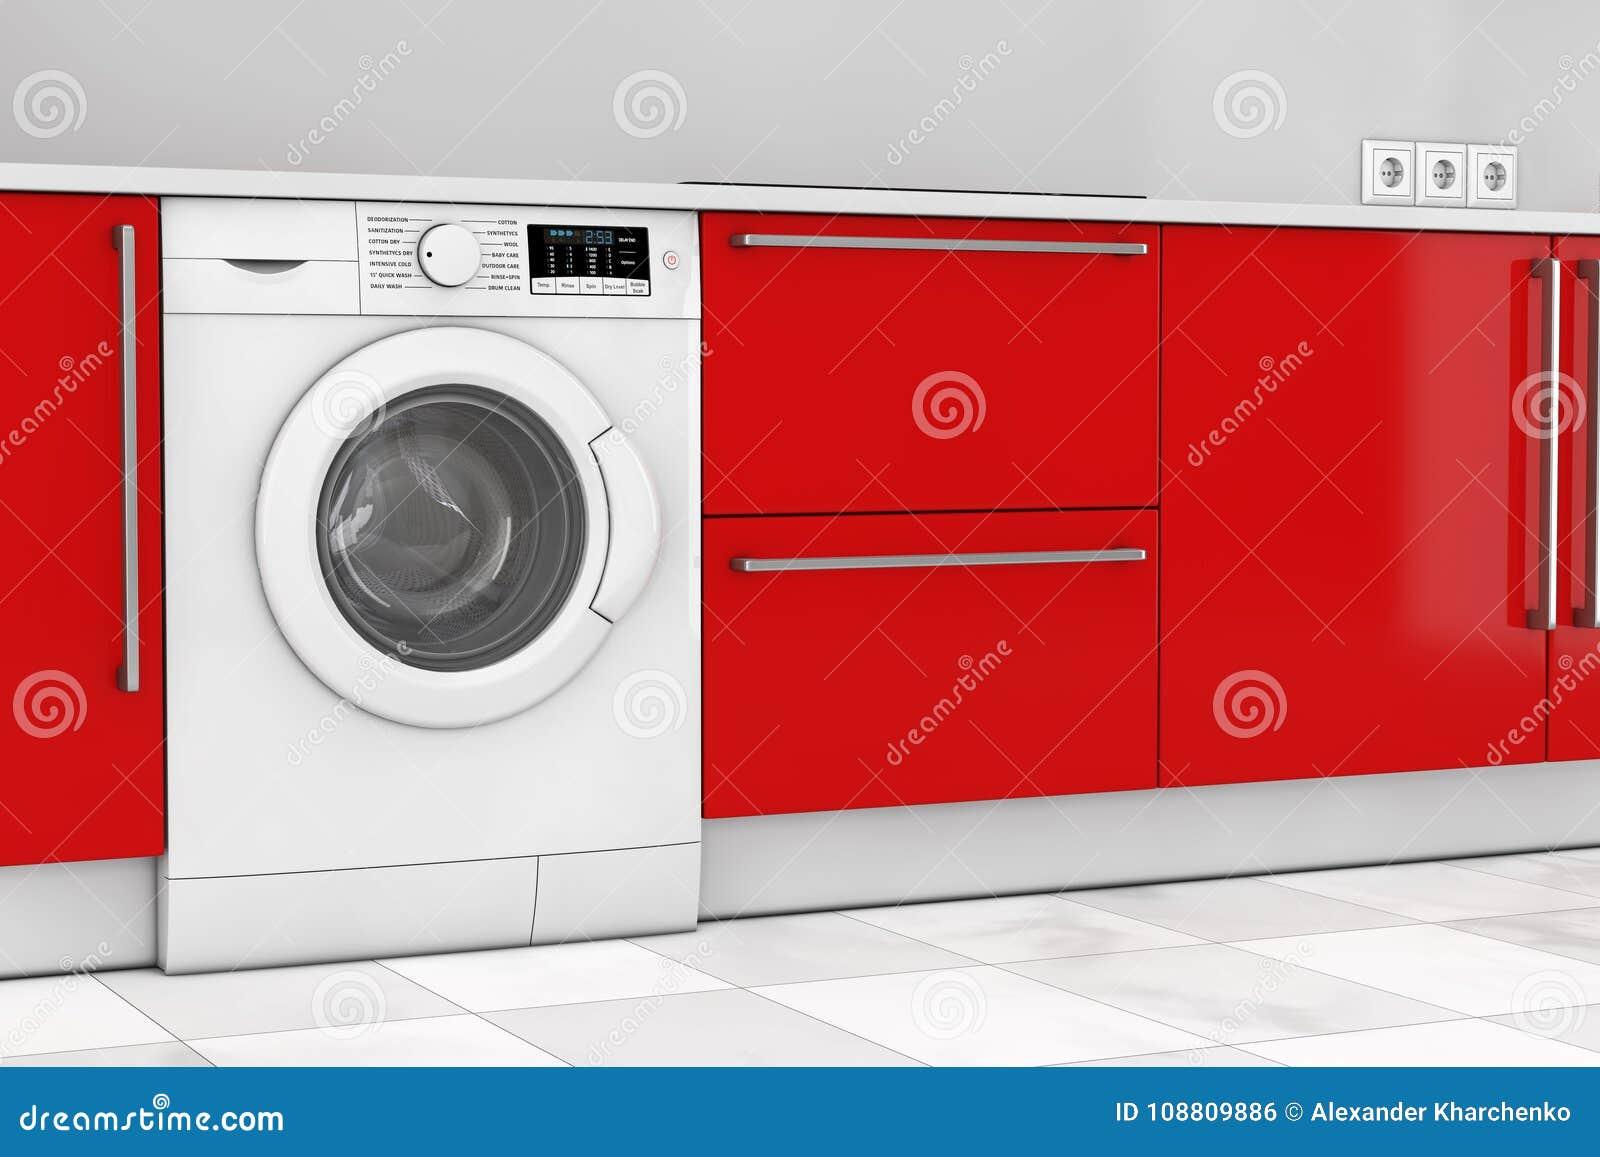 Lavatrice cucina perfect cucina with lavatrice cucina - Lavatrice in cucina ...